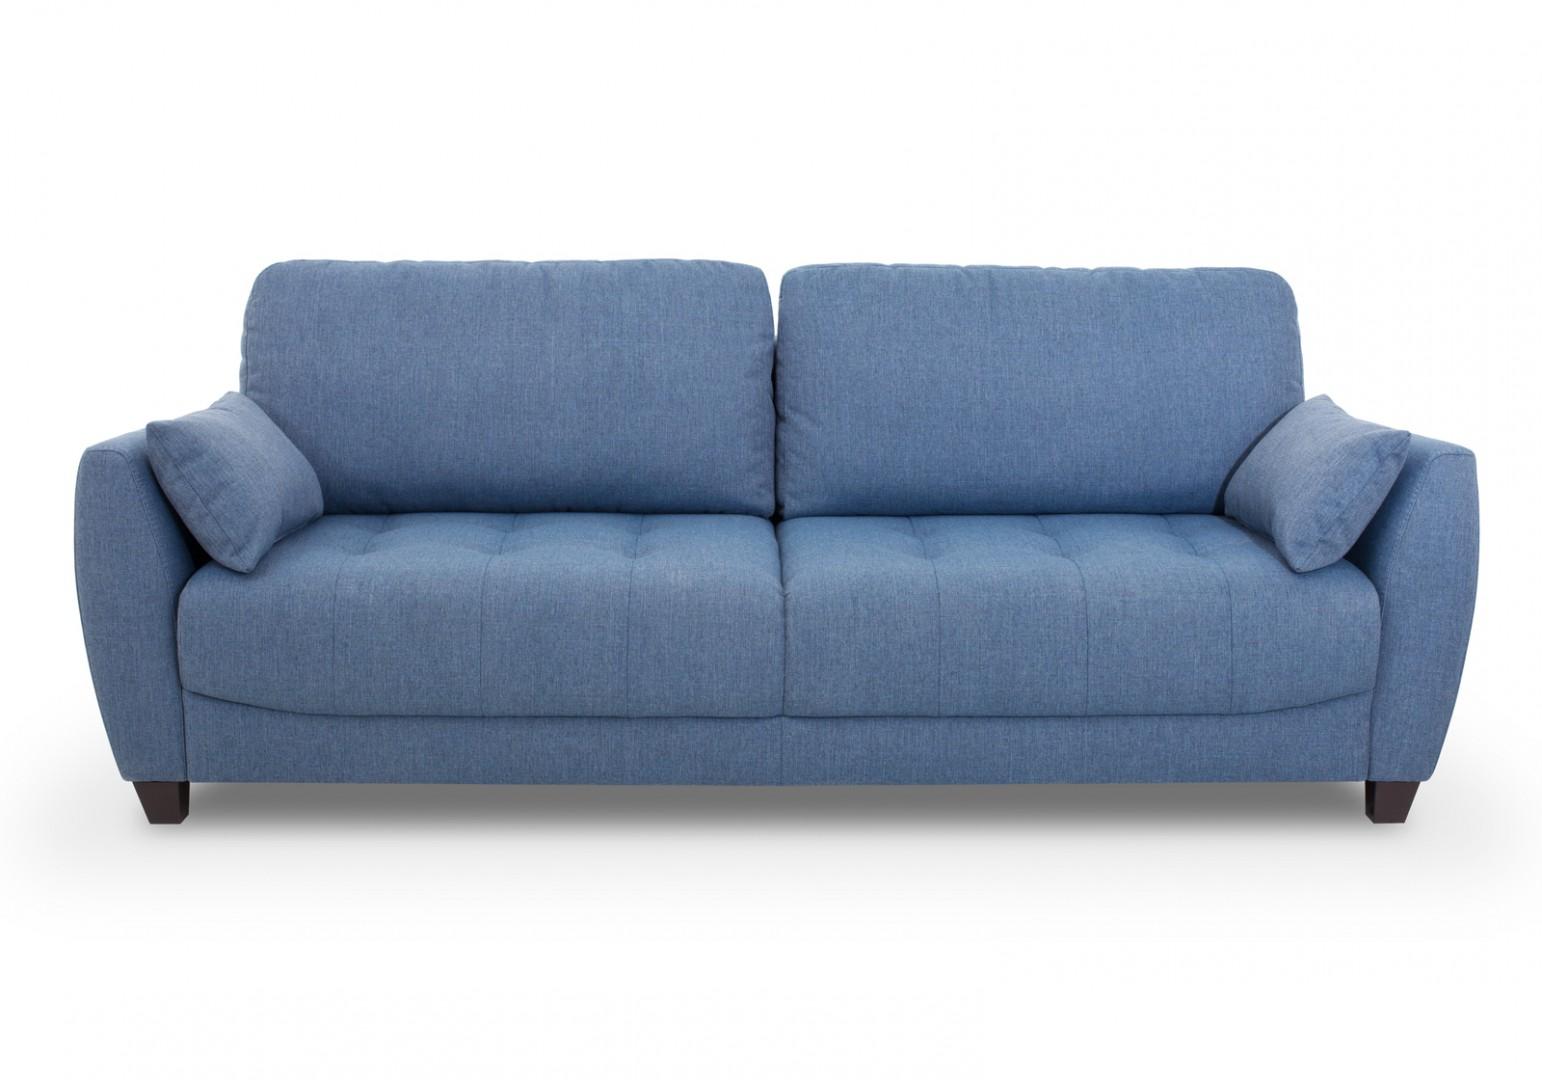 Sofa Tivoli oferowana w sklepach Agata. Fot. Agata